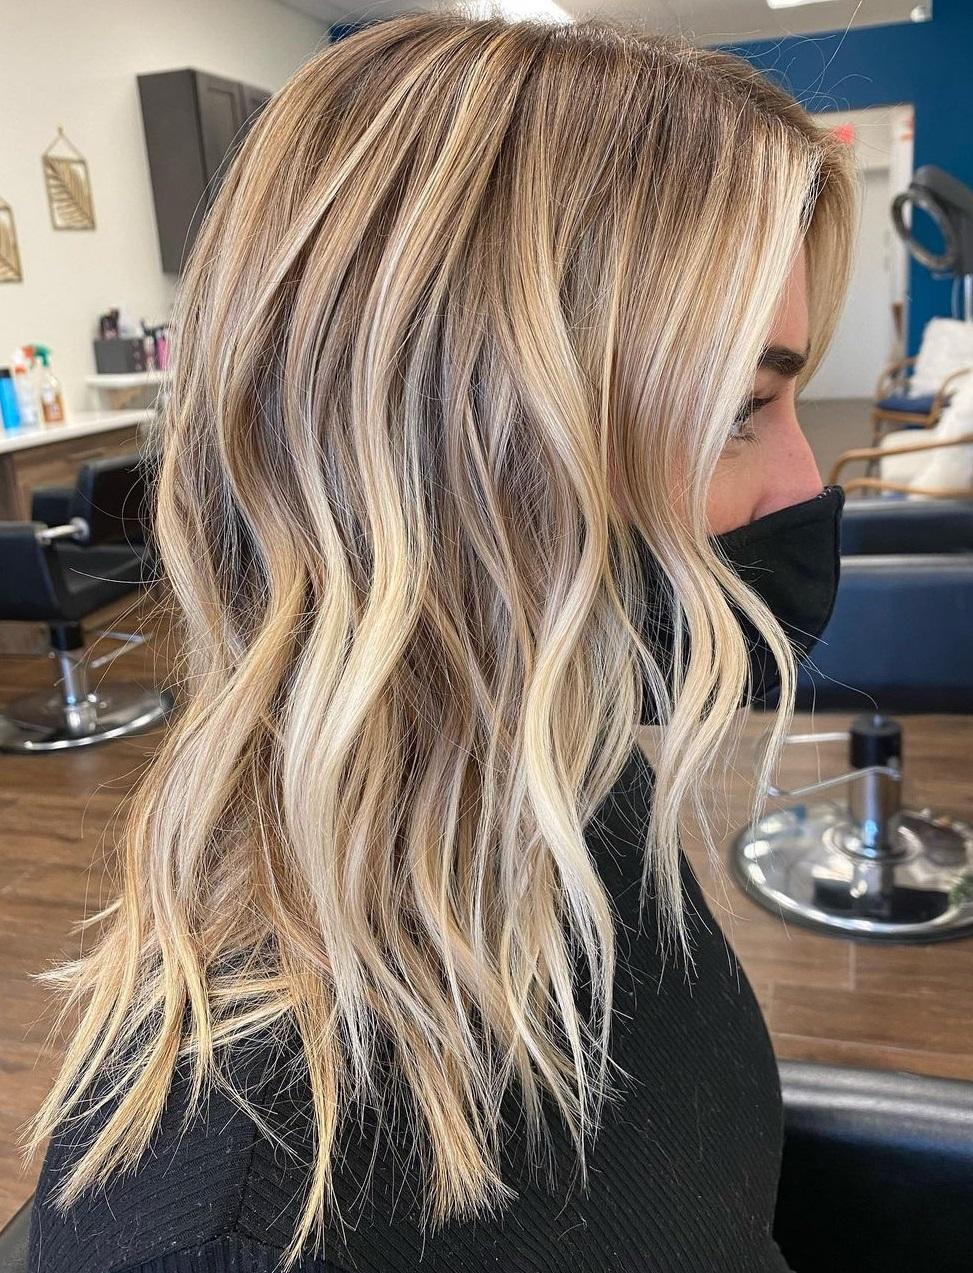 Choppy Cut with Warm Blonde Balayage